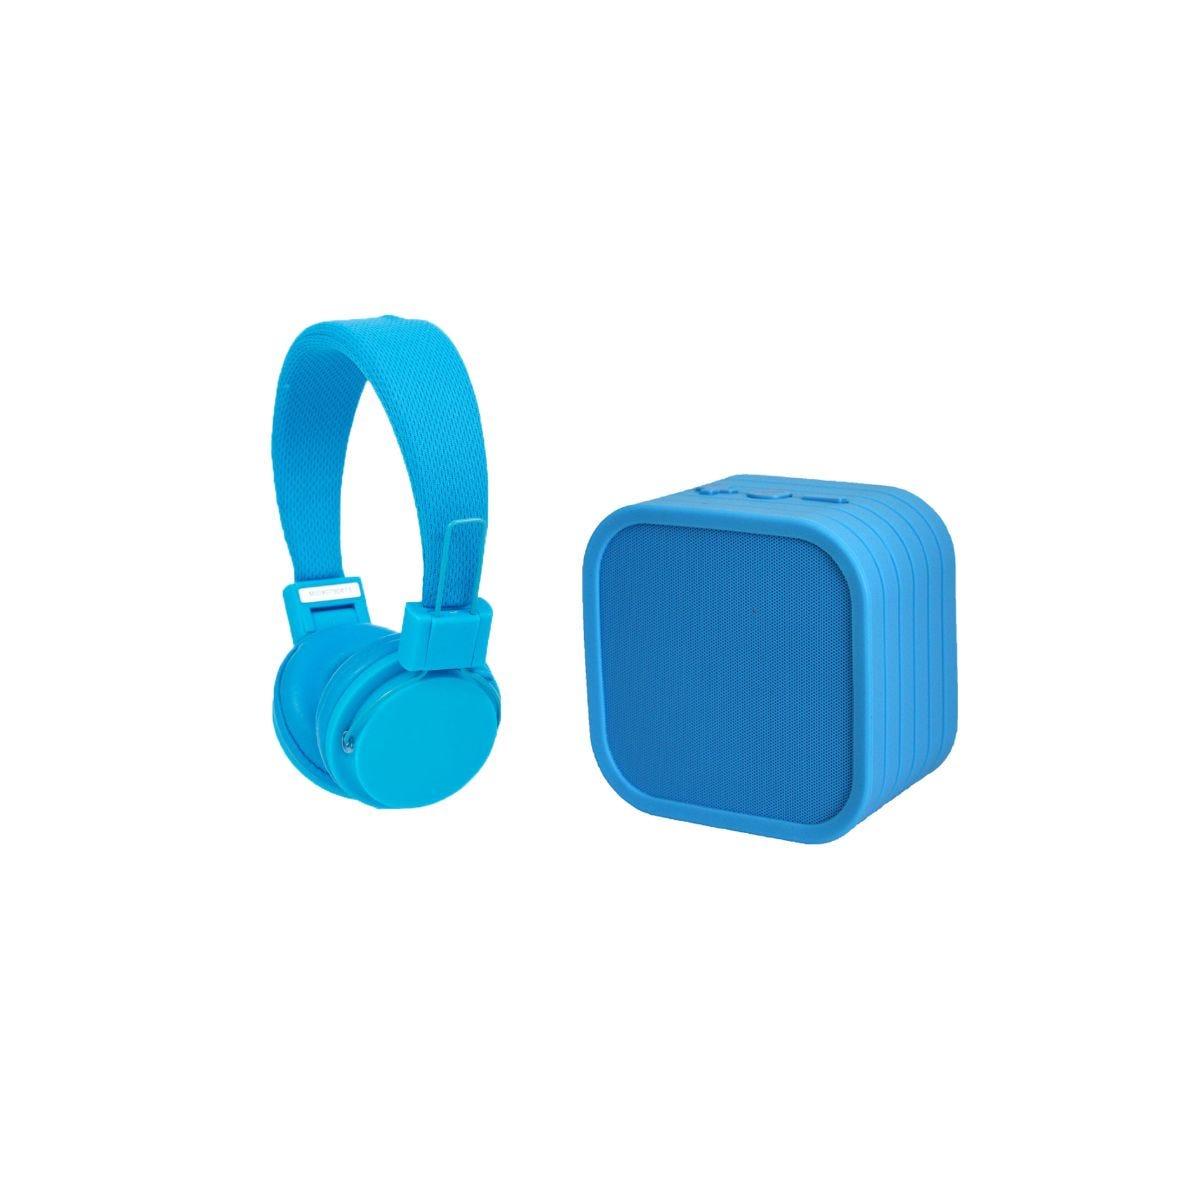 Image of Vivitar Neon Bluetooth Speaker and Headphones Blue, Blue